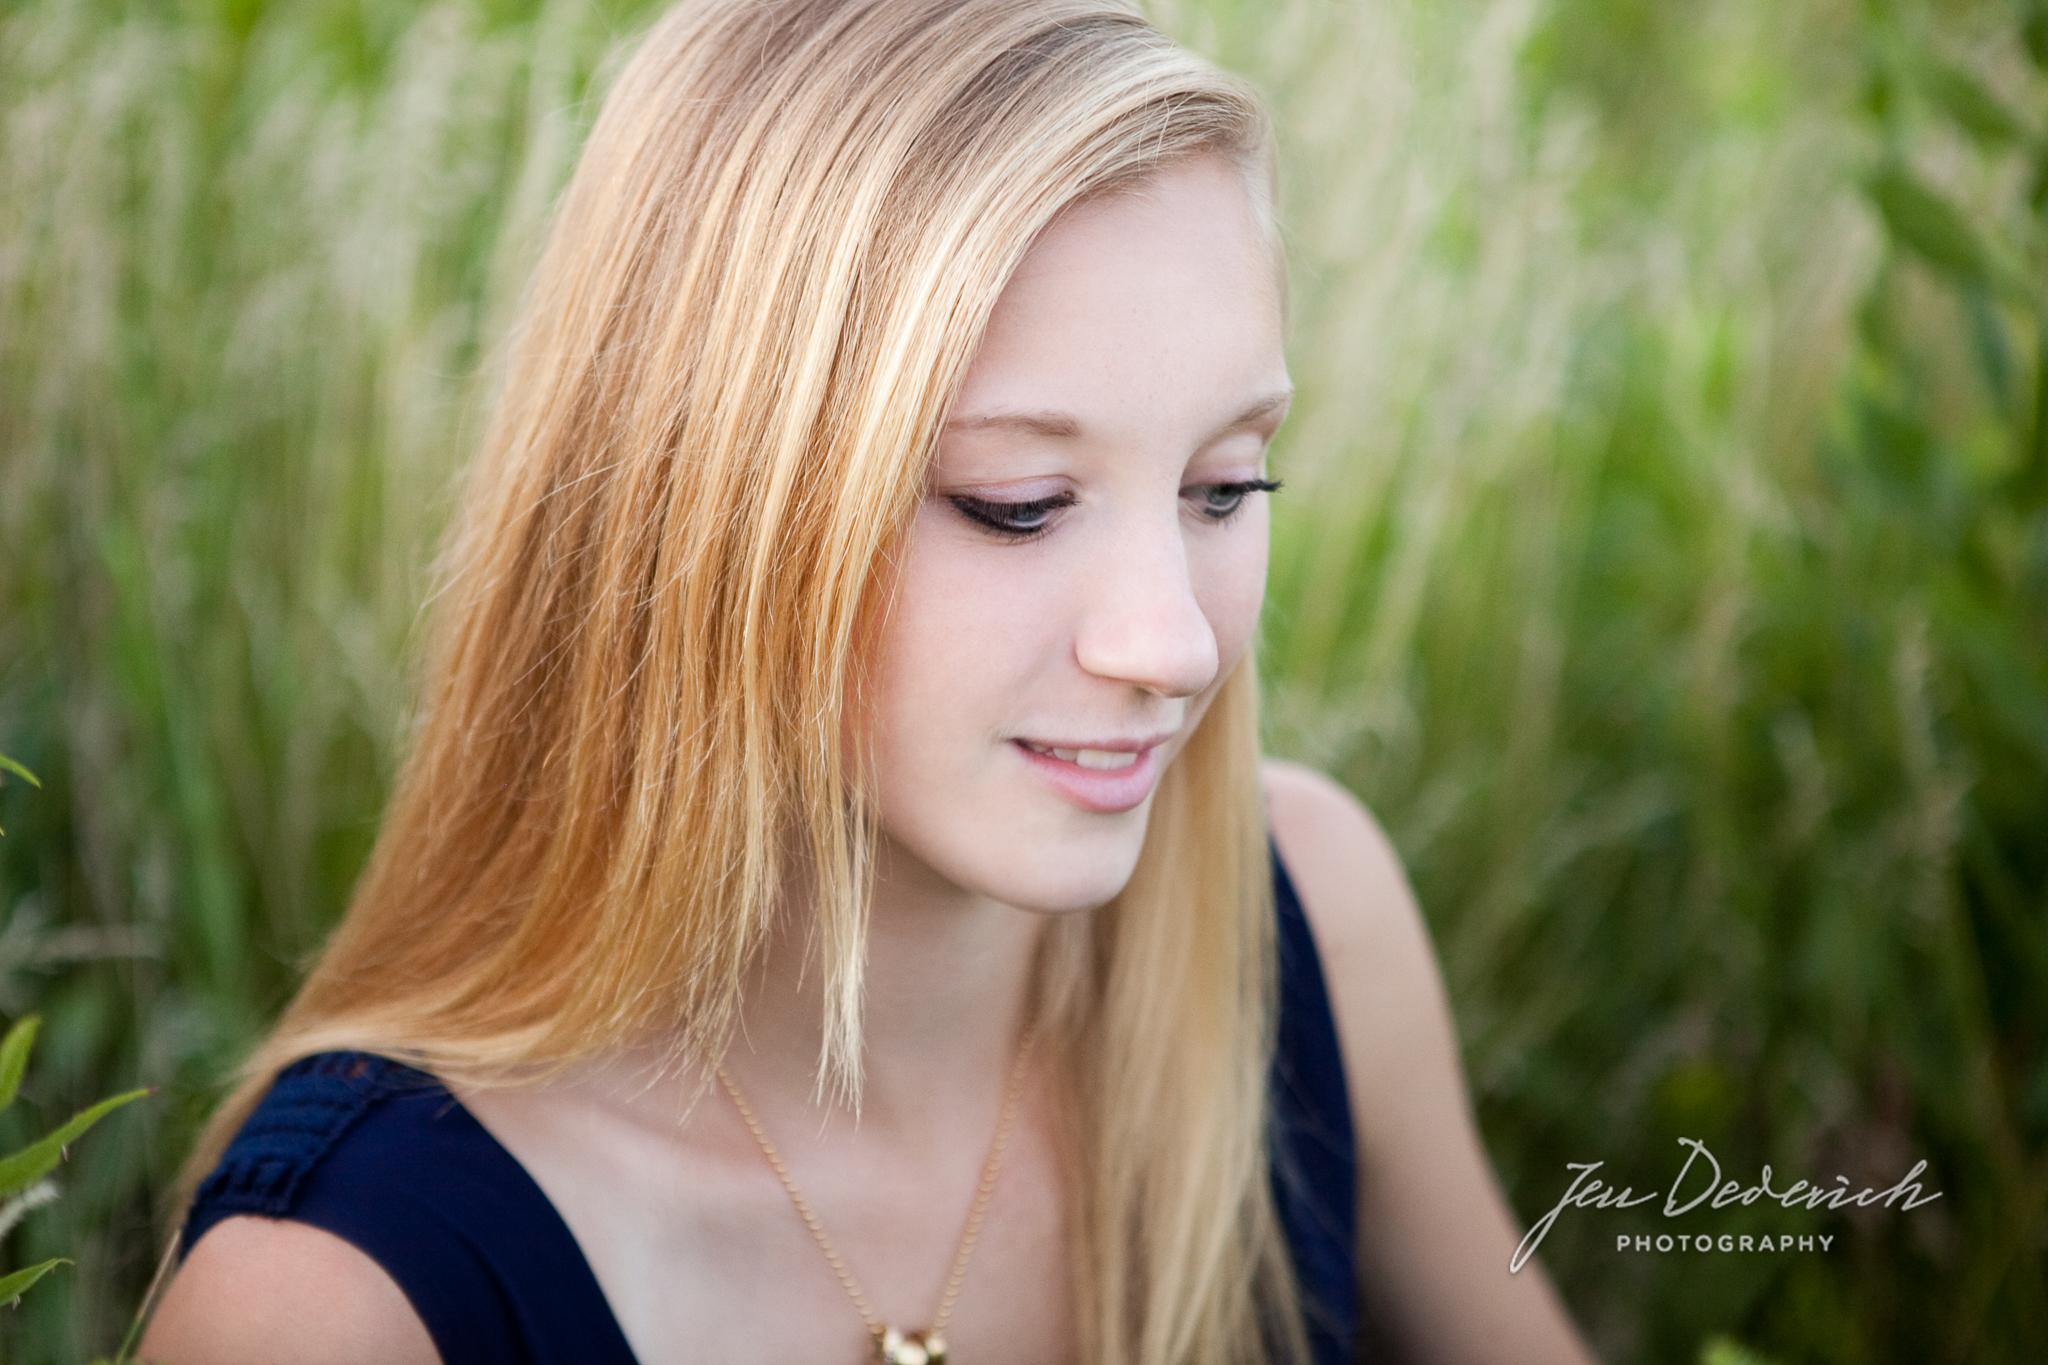 Senior_Madison WI_Jen Dederich Photography_006.jpg